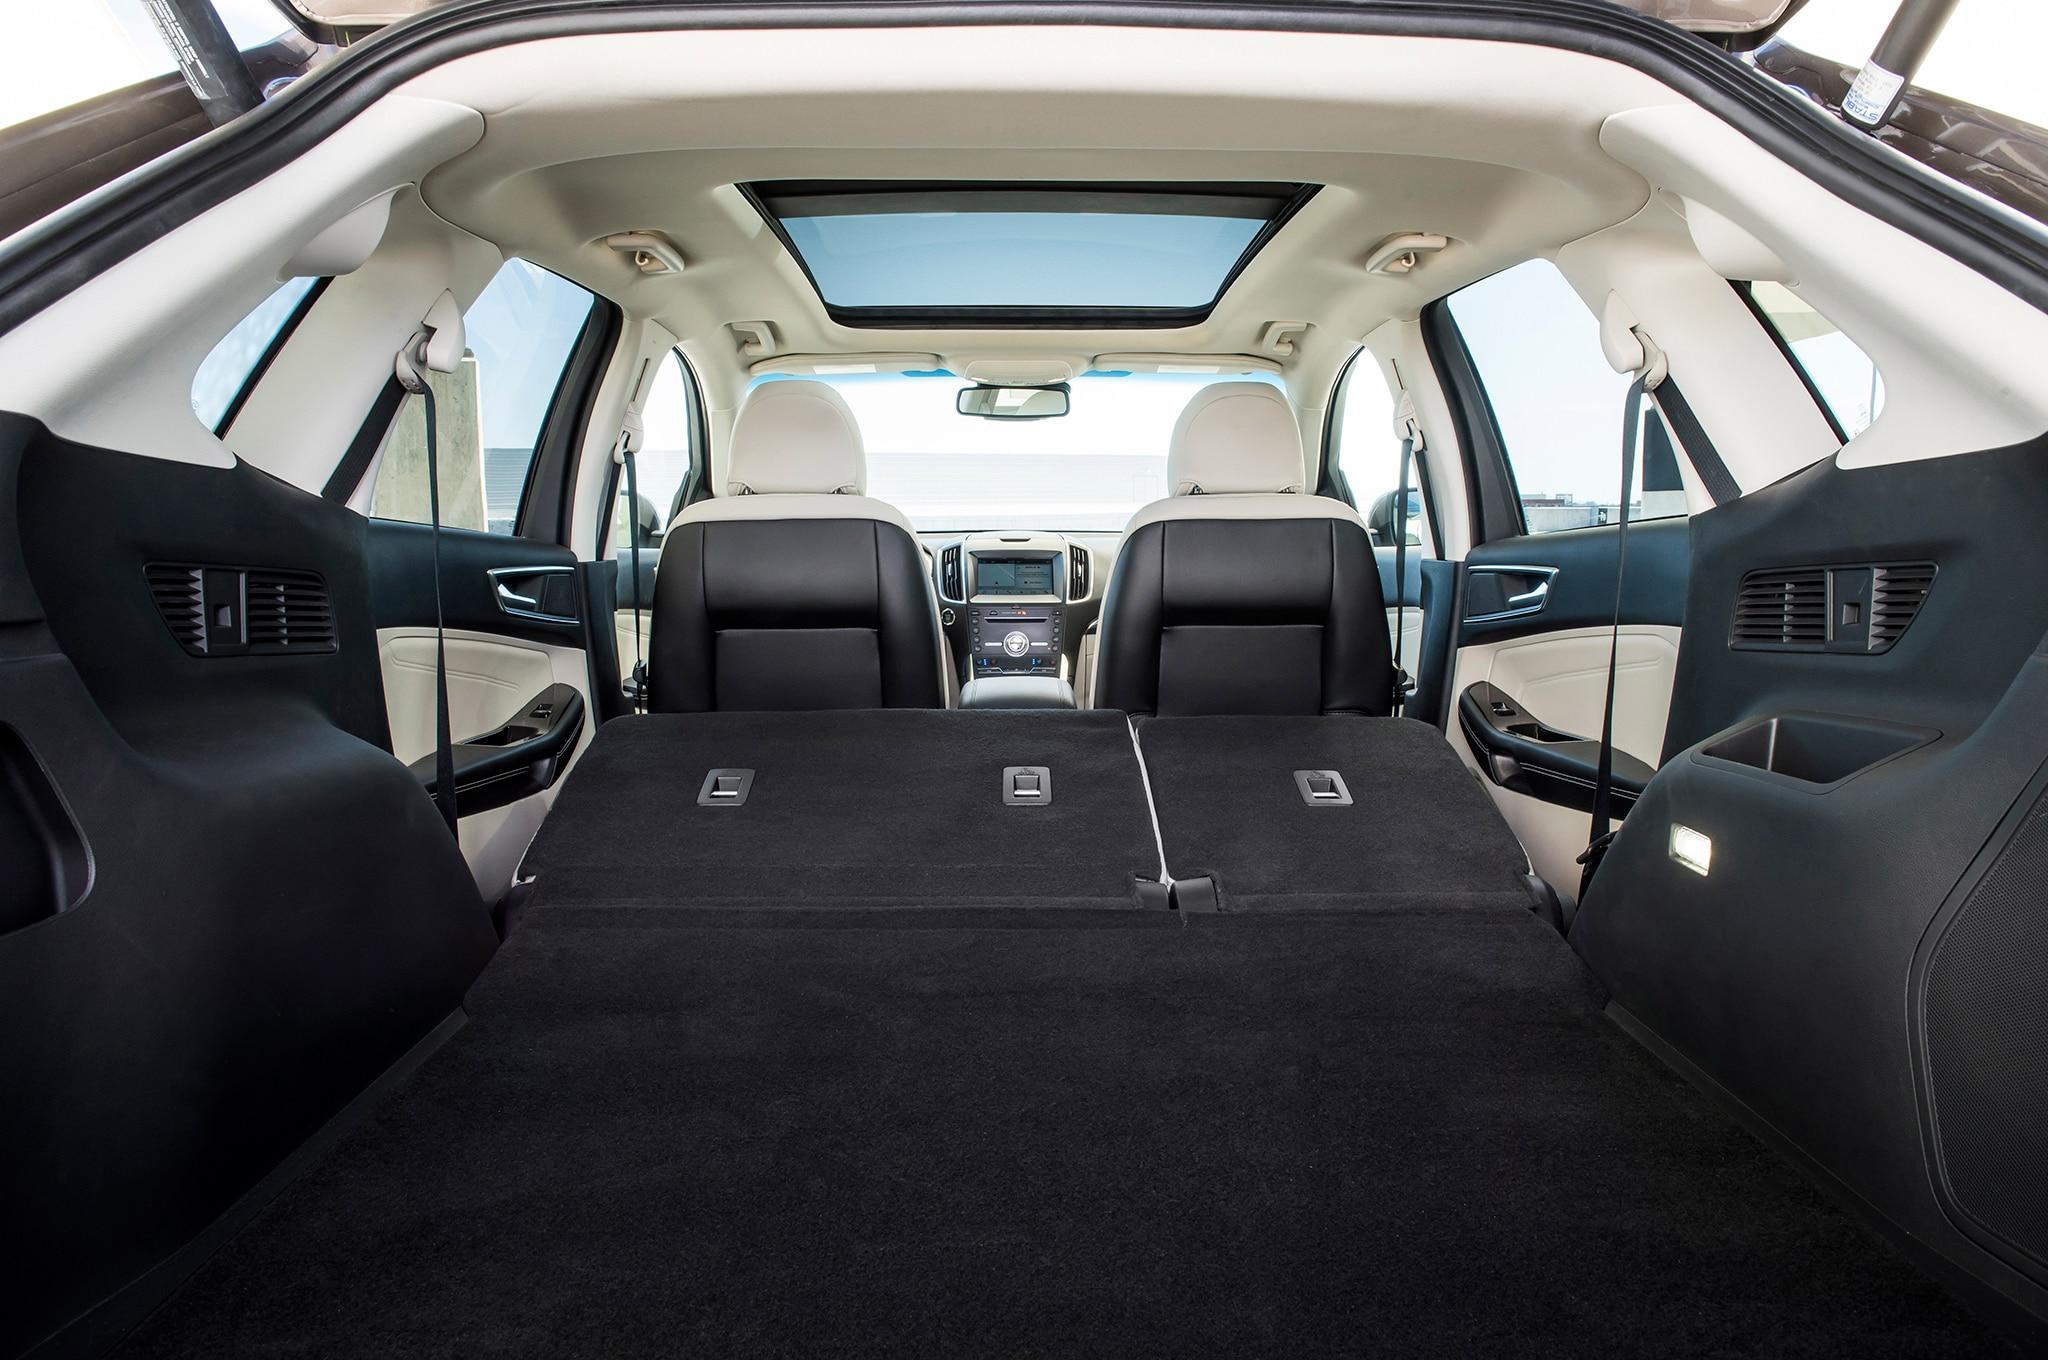 2019 Ford Edge Titanium Elite rear interior seats folded ...